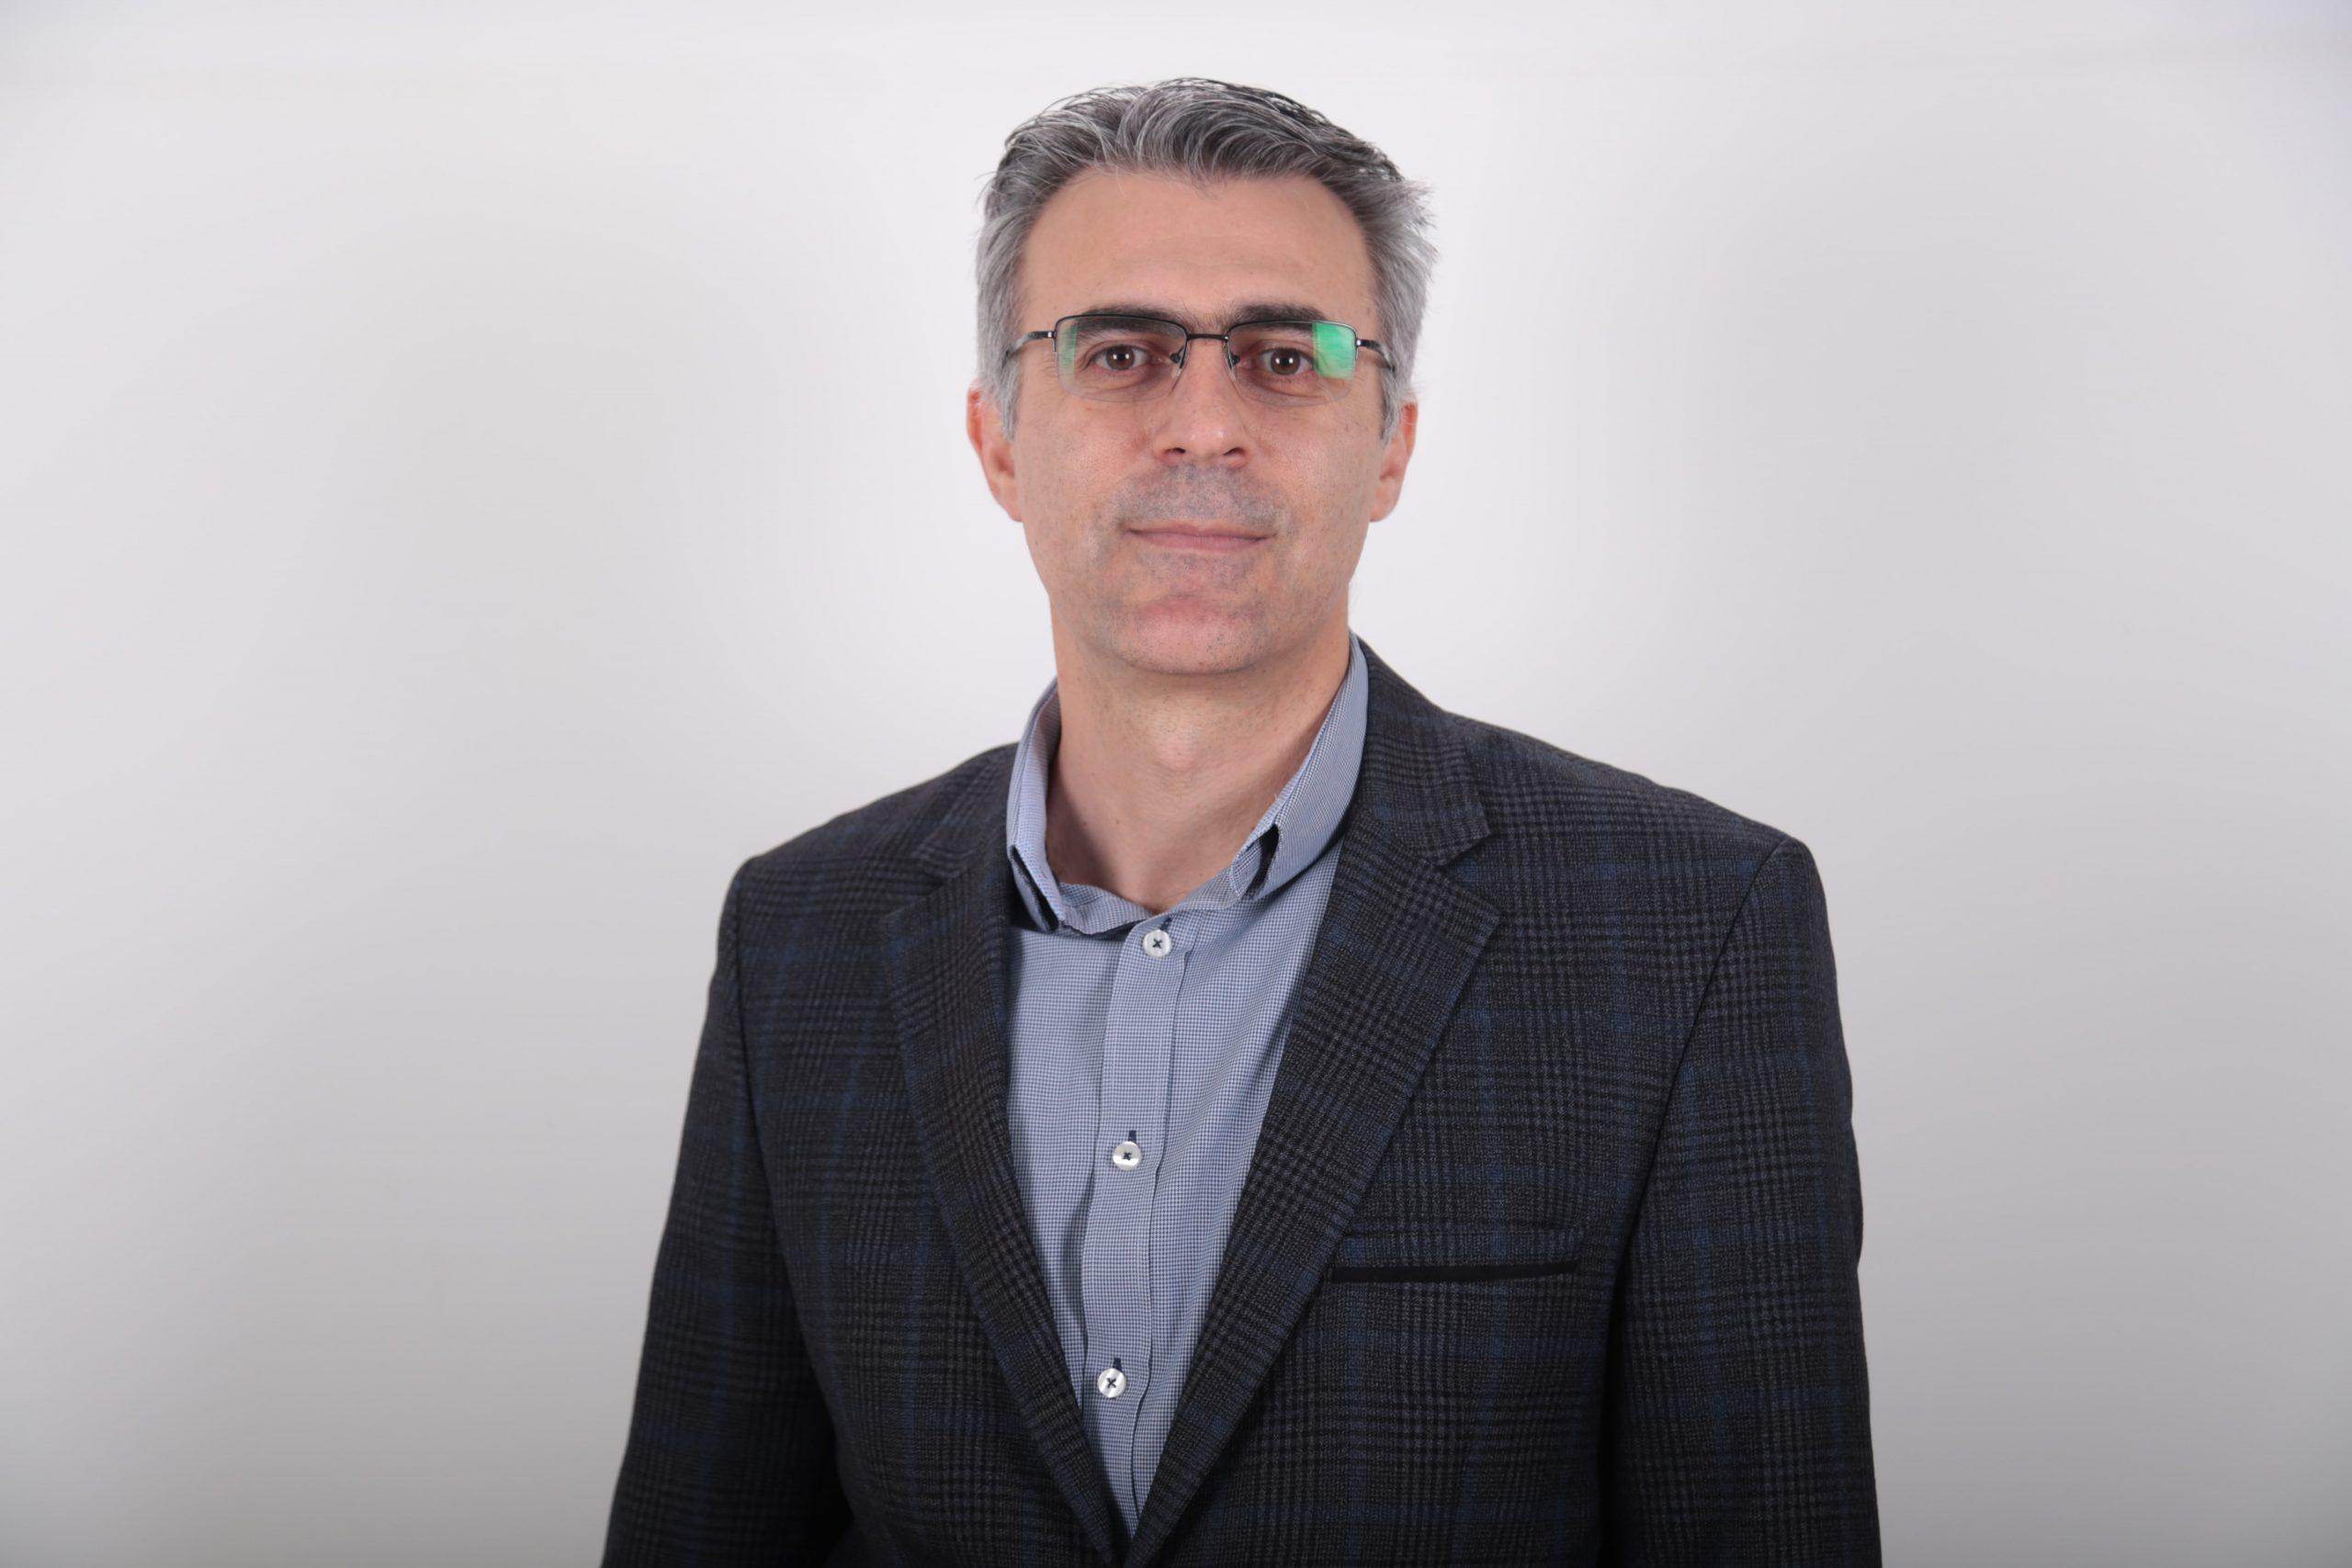 Ilir Salihu